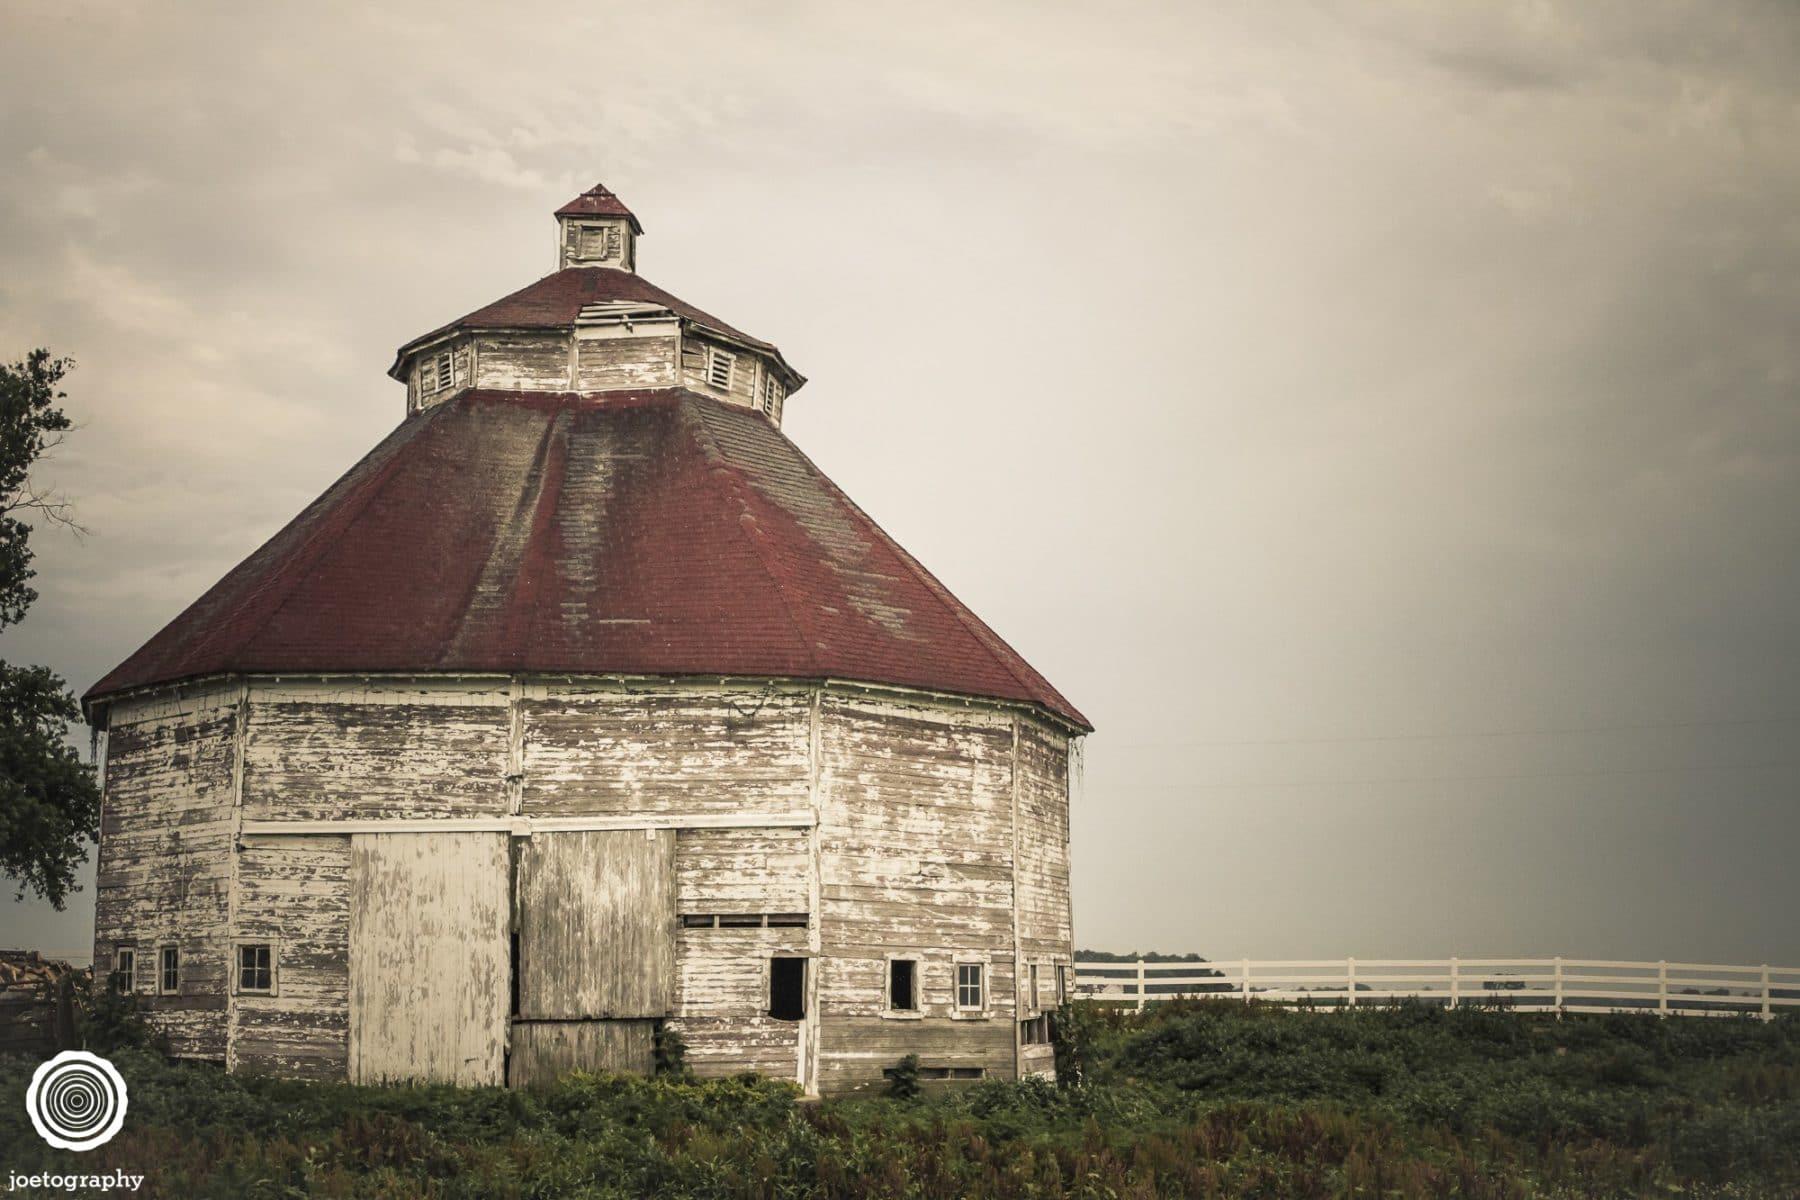 polygonal-barn-architecture-photos-shelbyville-indiana-21